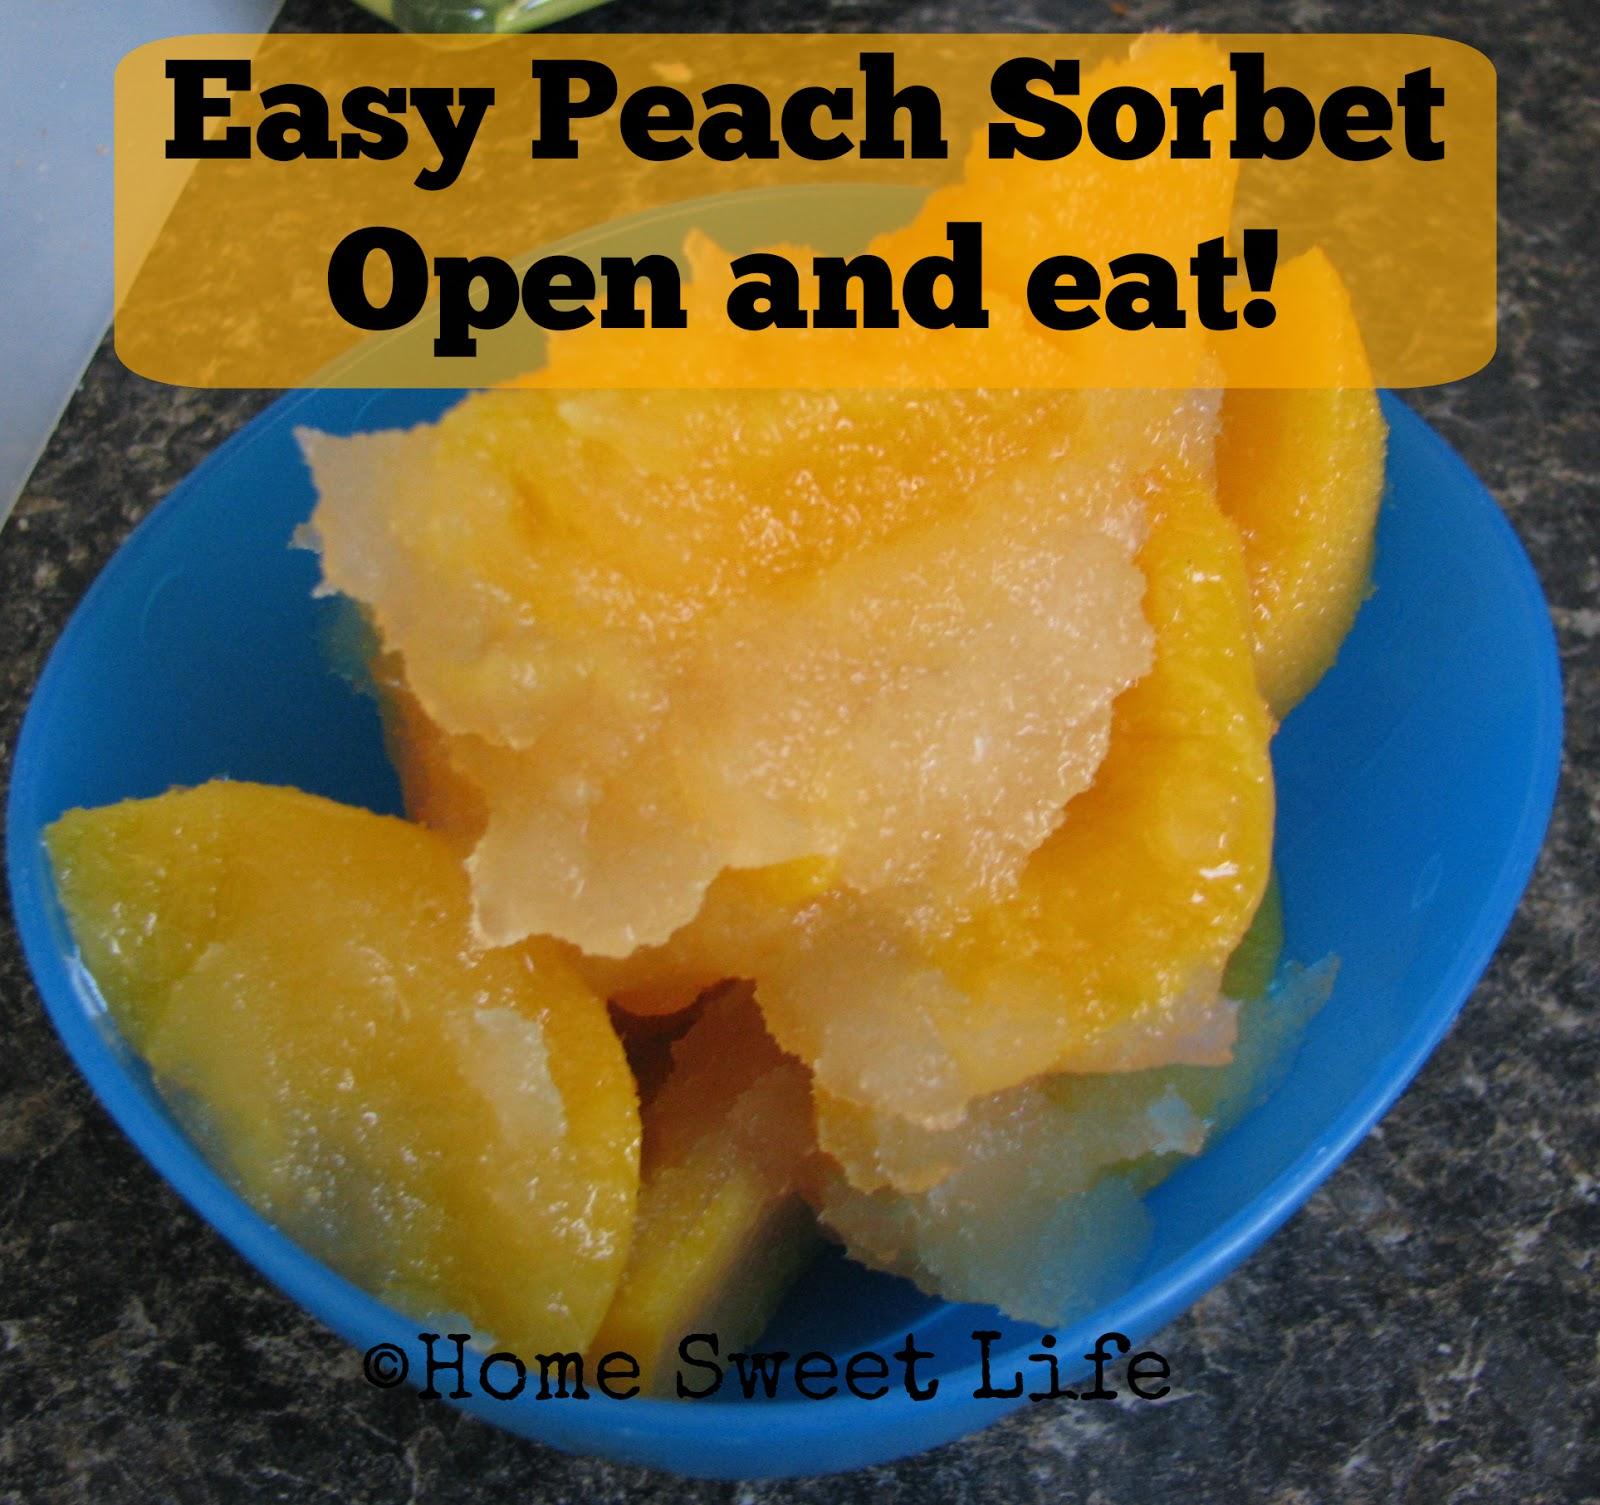 Easy Peach Sorbet